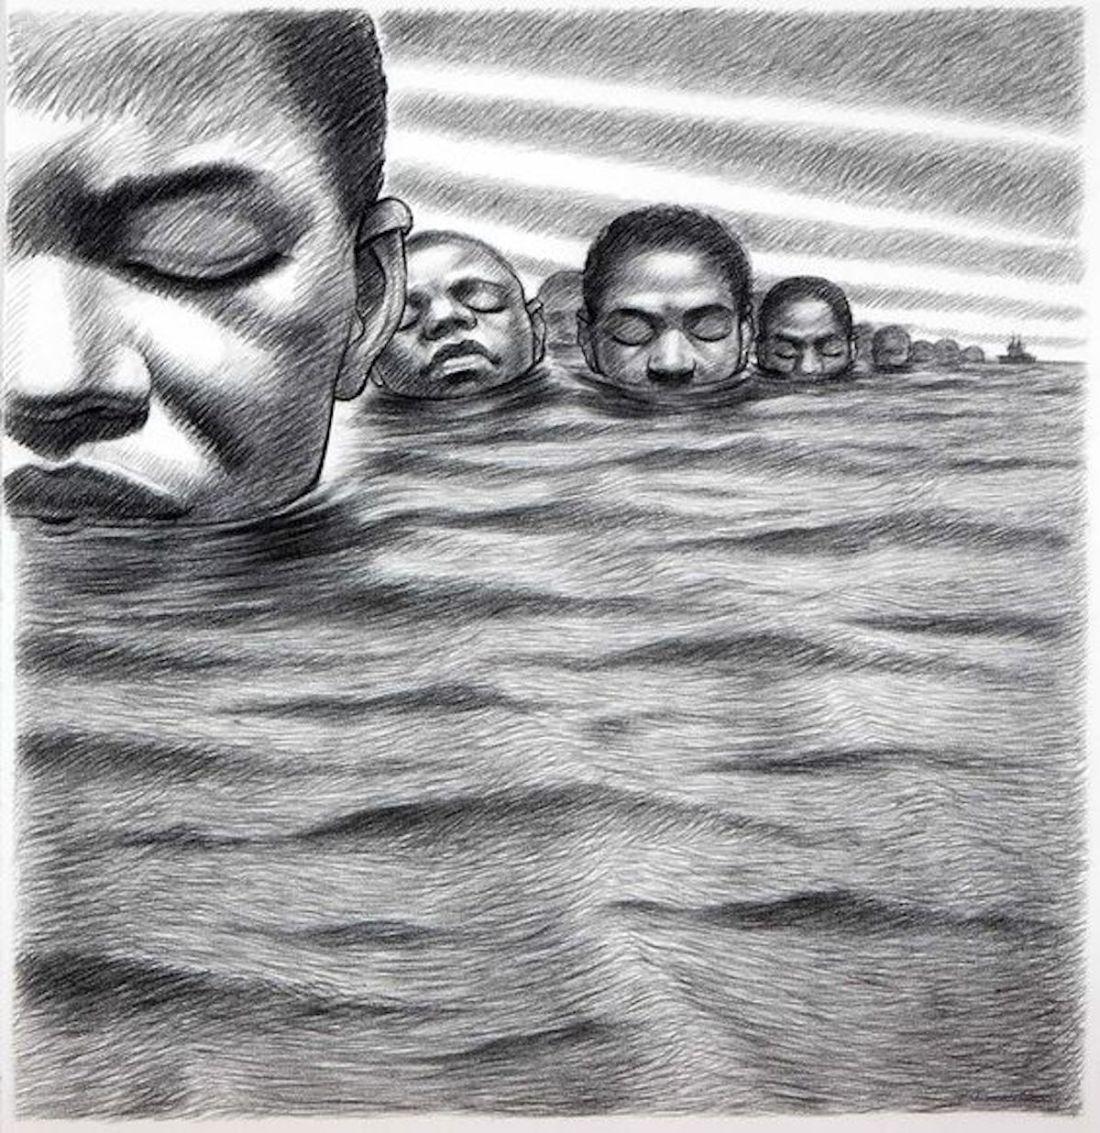 Donovan Nelson, The Igbo Landing, Nigerian History, Nigeria, Igbo, Slavery, Slave Revolt, African History, Black History, KOLUMN Magazine, KOLUMN, KINDR'D Magazine, KINDR'D